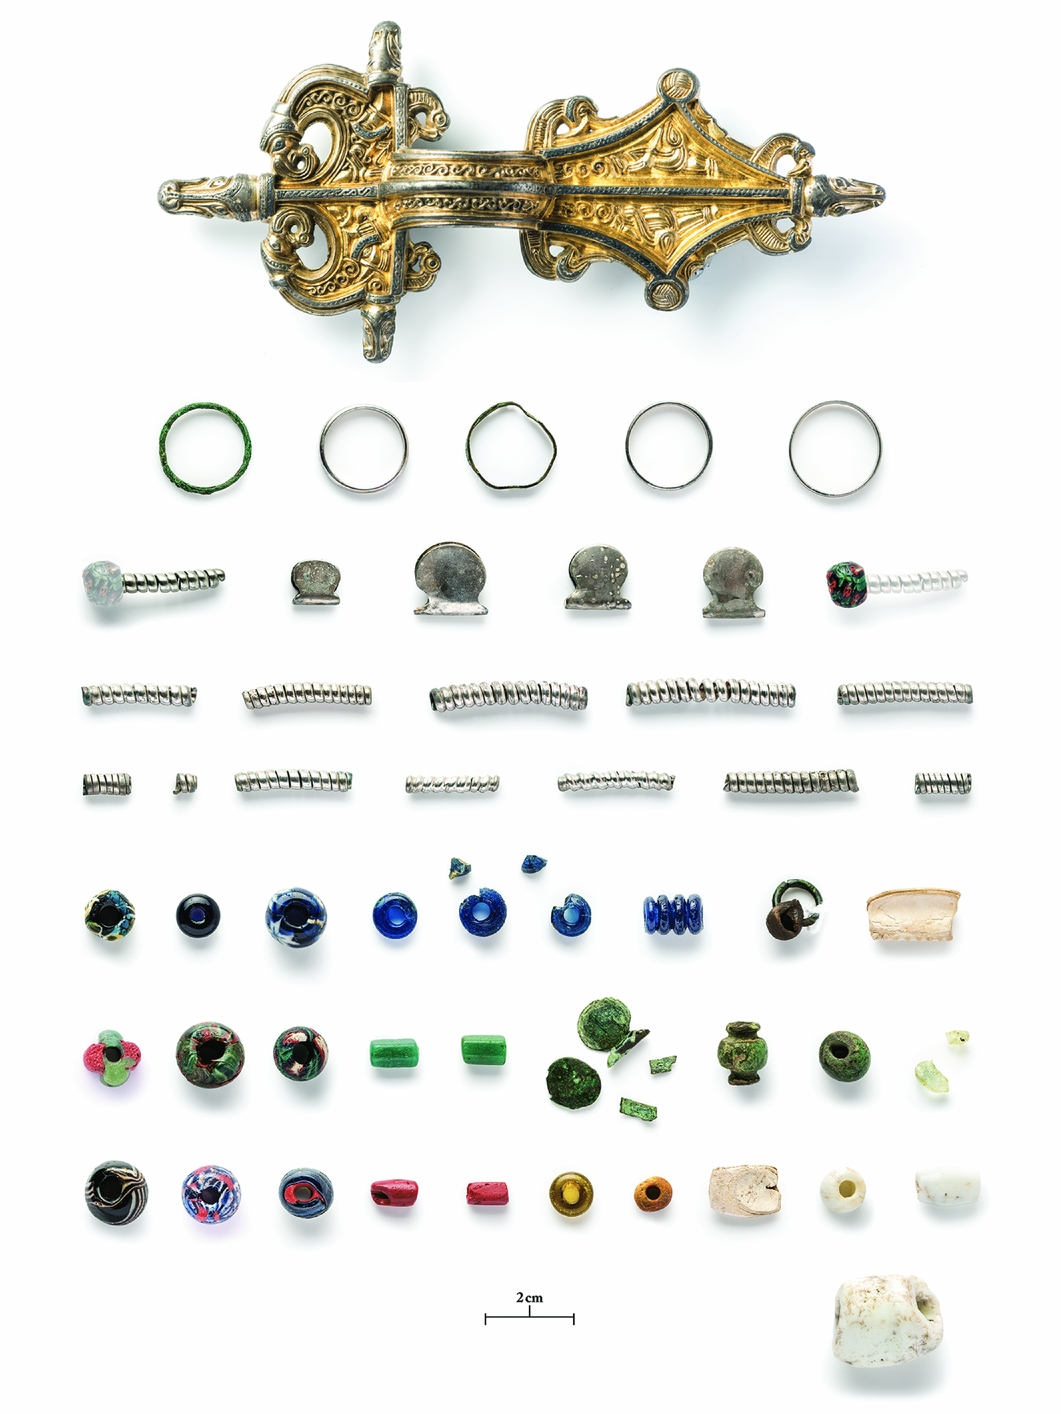 Artifacts found during a metal detector survey in 2010. (Credit: Daniel Lindskog)